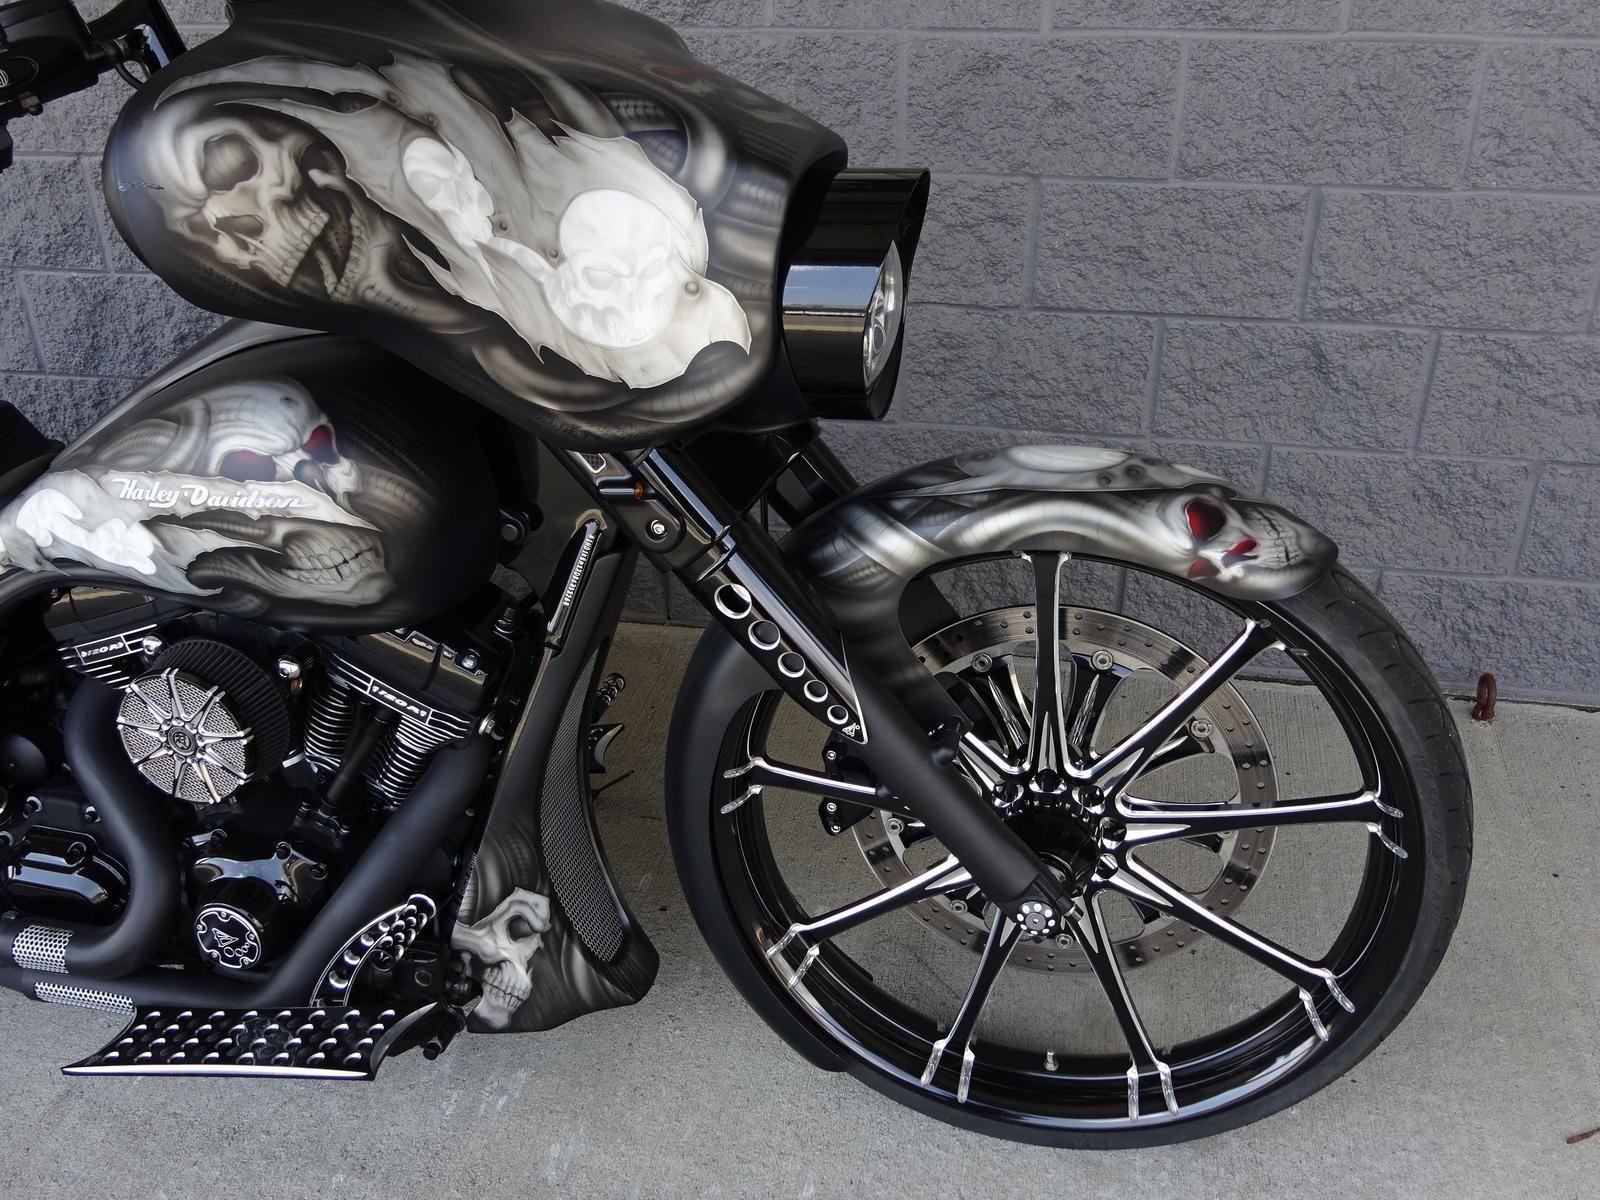 2013 harley davidson street glide custom bagger 26 wheel 120r motor